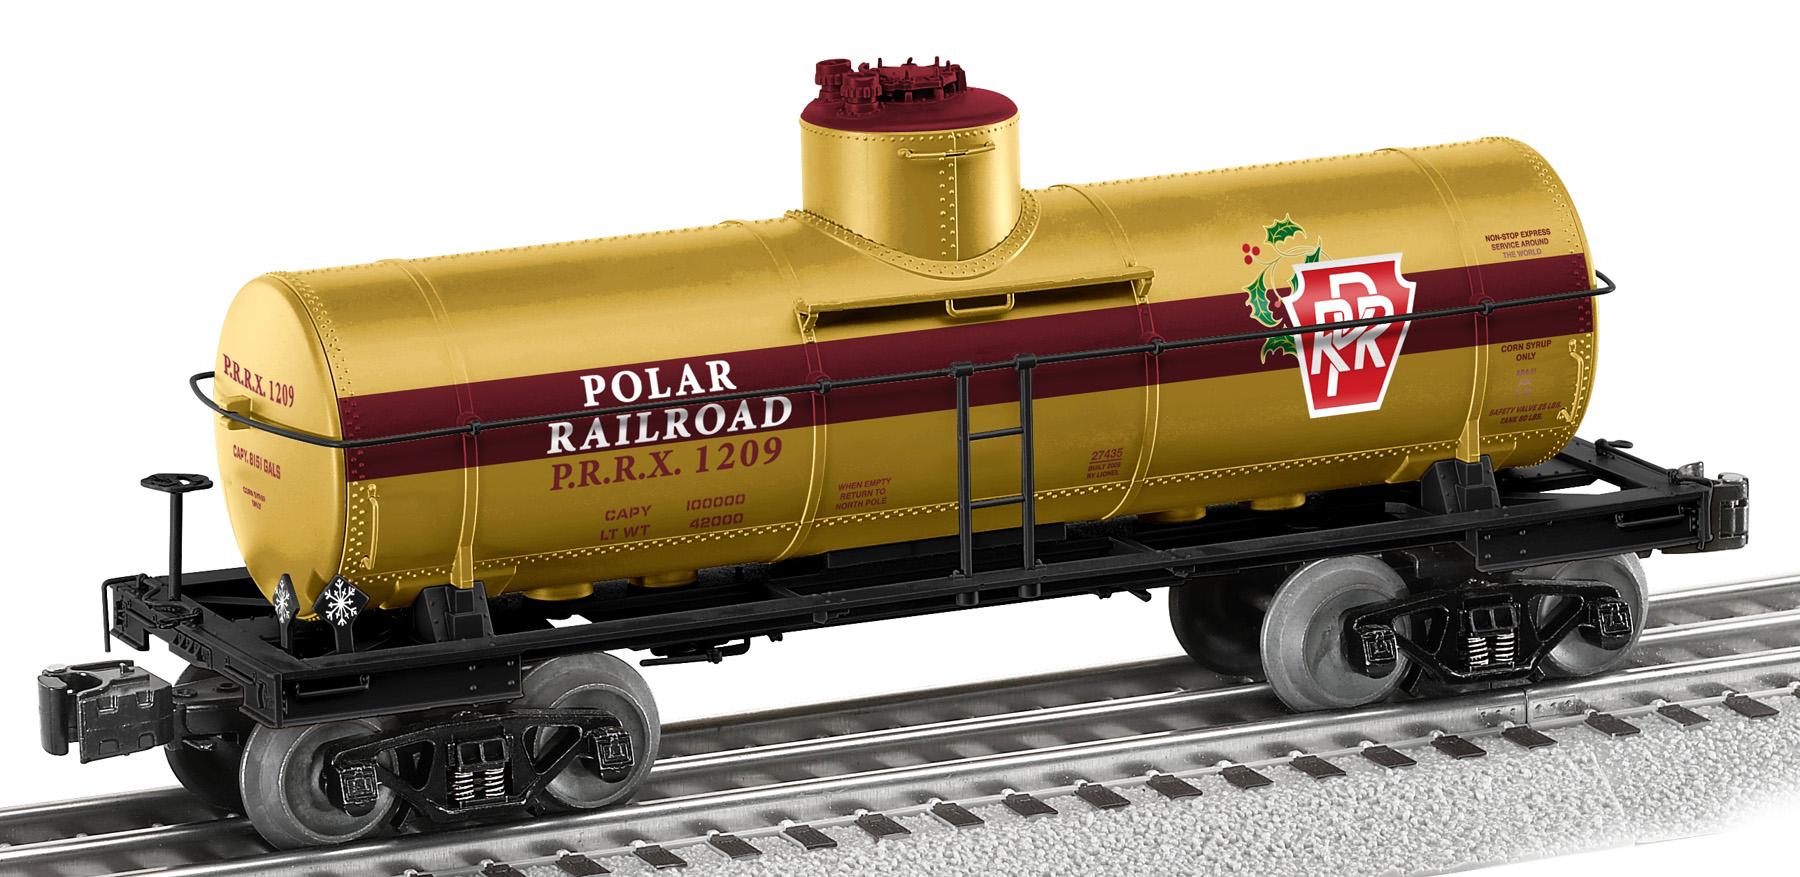 Lionel Train 6-16674 Animated Gondola Car A84 PU for sale online